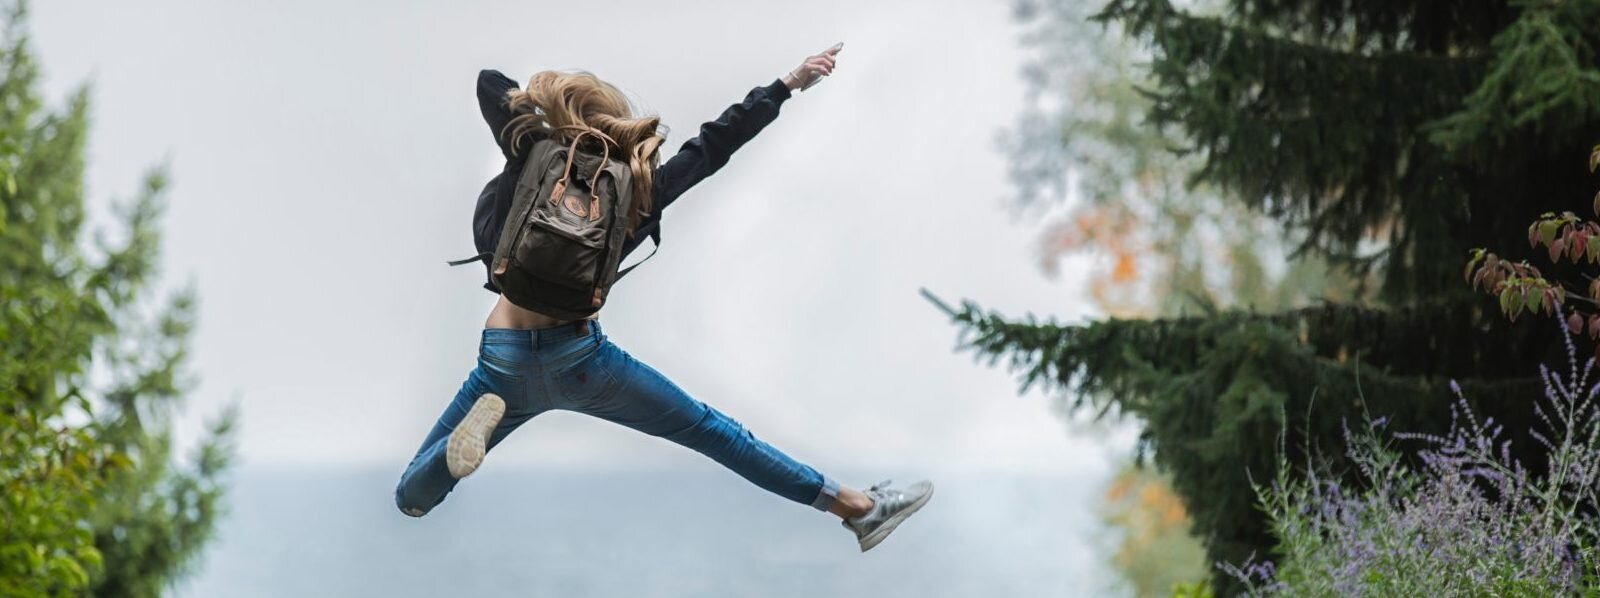 backpack-blonde-hair-blur-214574-e1539026569184-1600x598.jpg